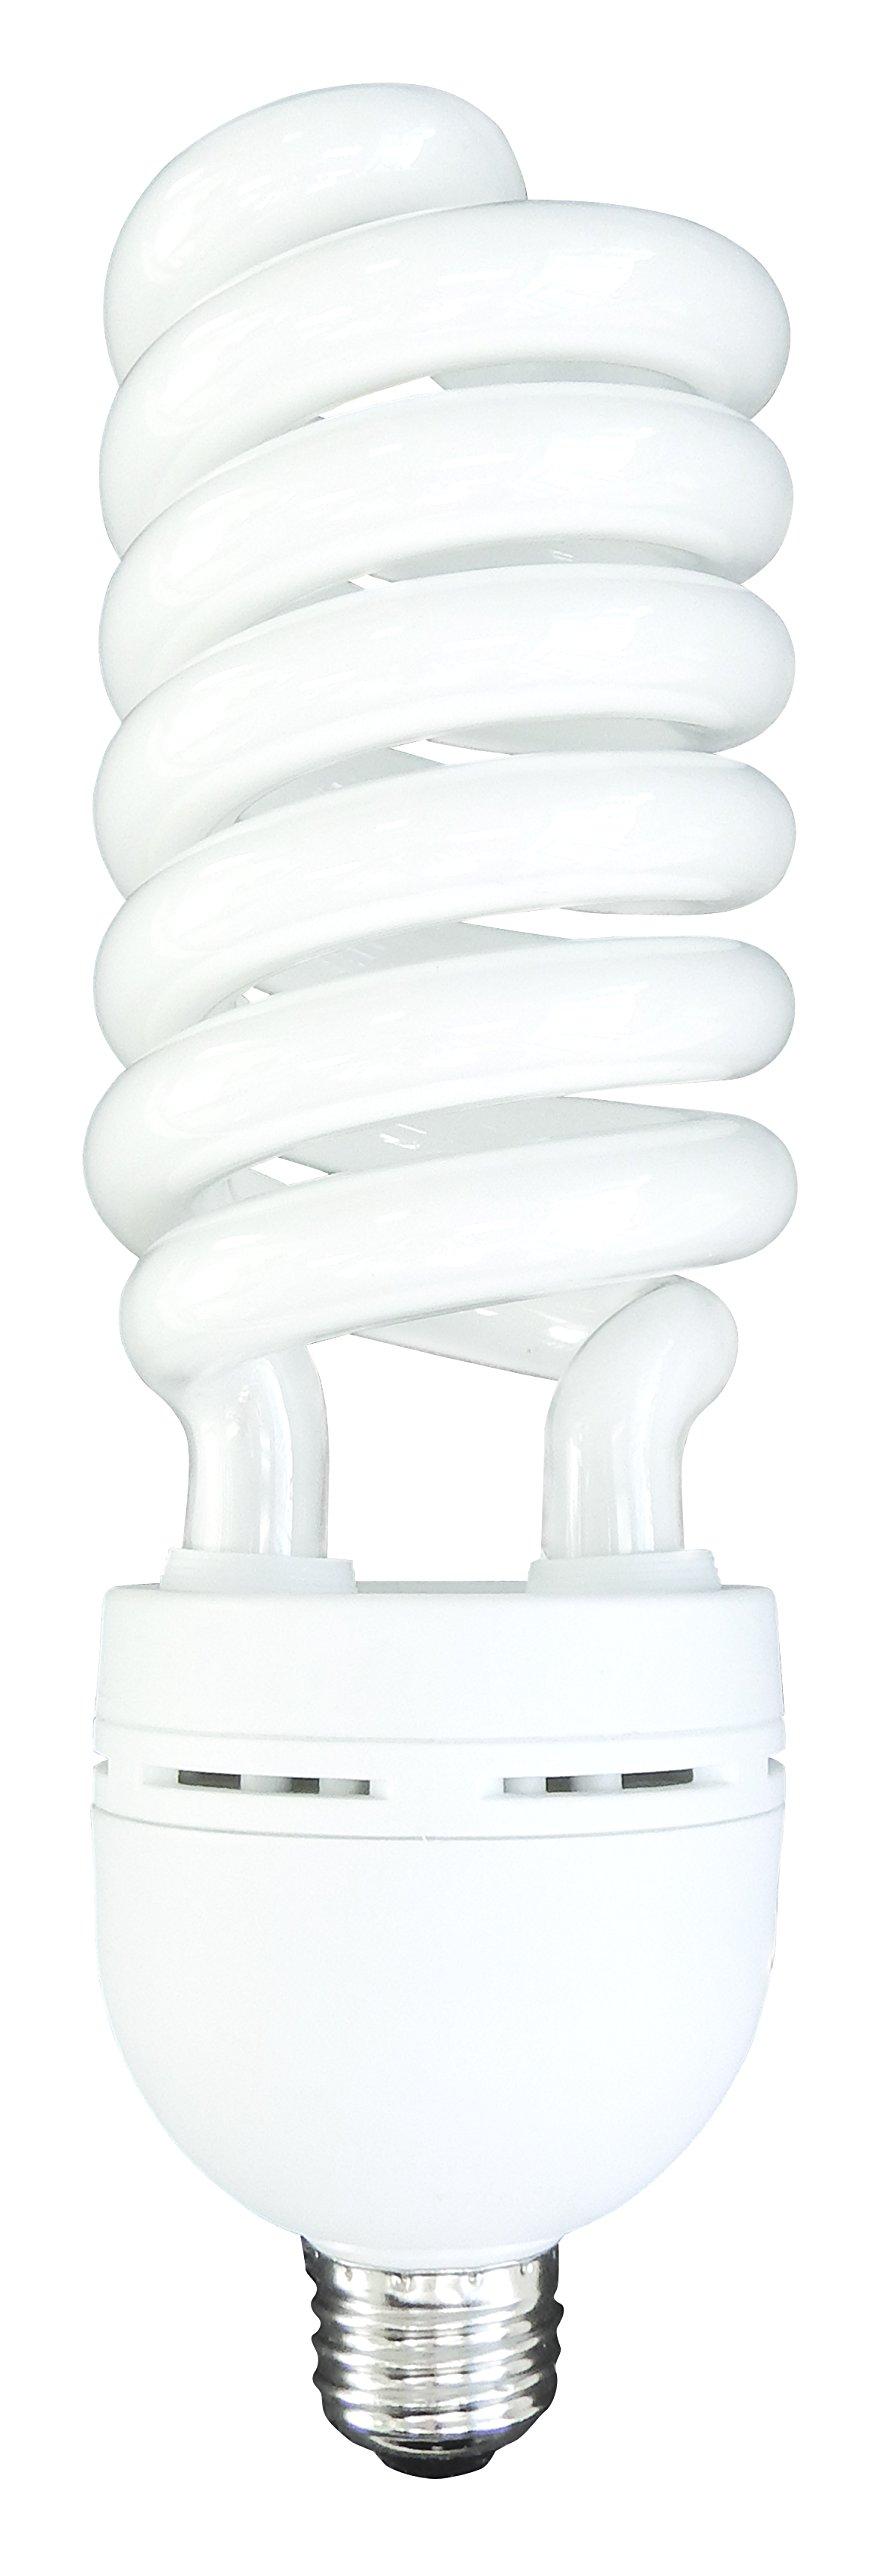 Luxrite LR20220 (12-Pack) 85-Watt High Wattage CFL Spiral Light Bulb, Equivalent To 350W Incandescent, Warm White 2700K, 5150 Lumens, E26 Standard Base by LUXRITE (Image #2)